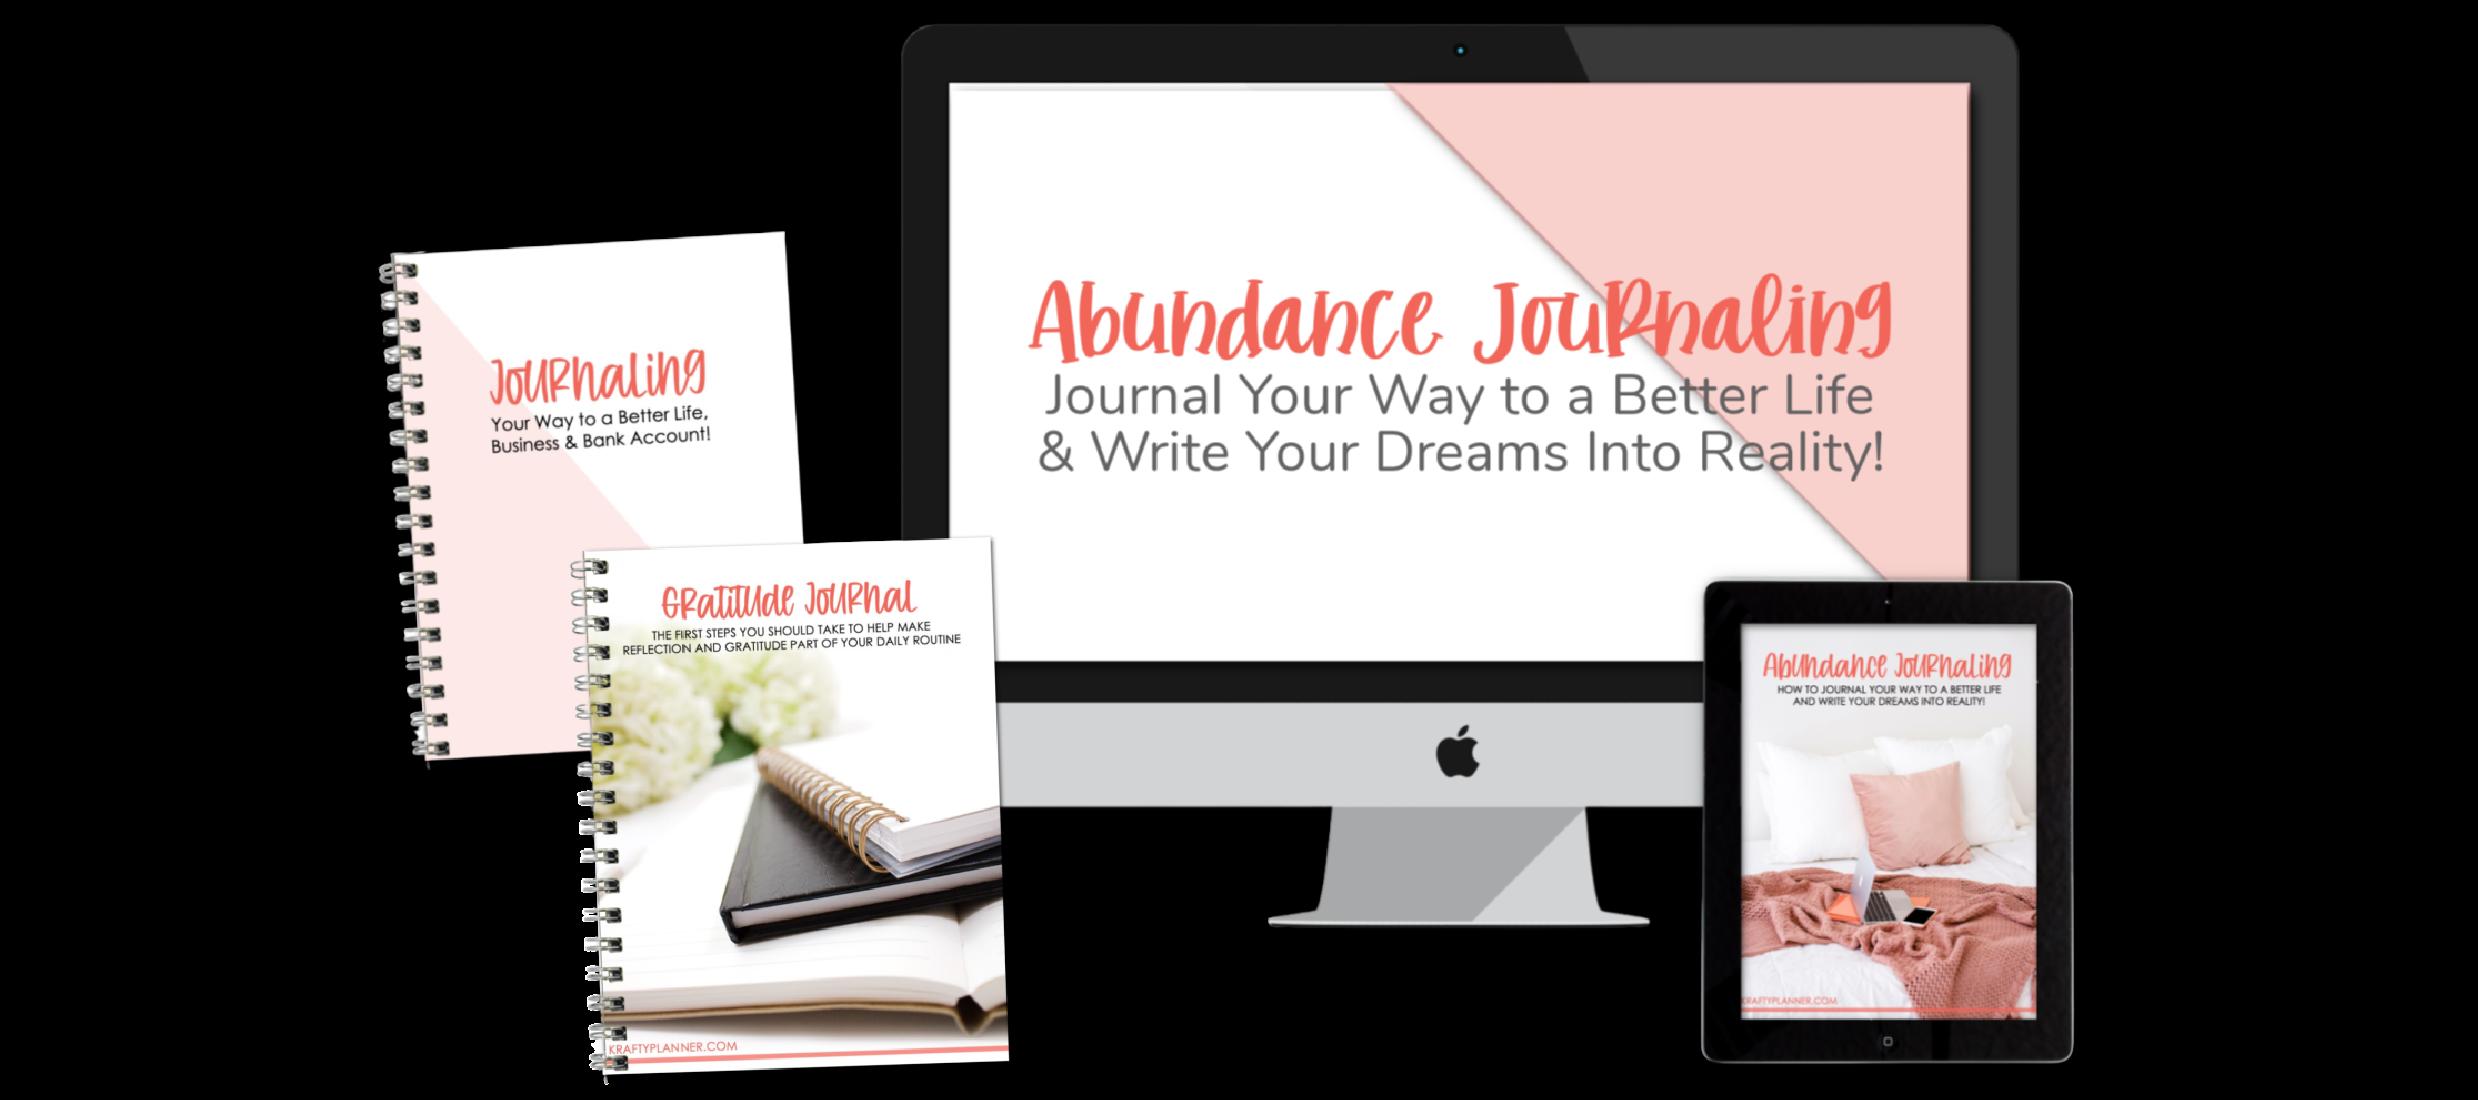 Abundance Journaling Course Content.png